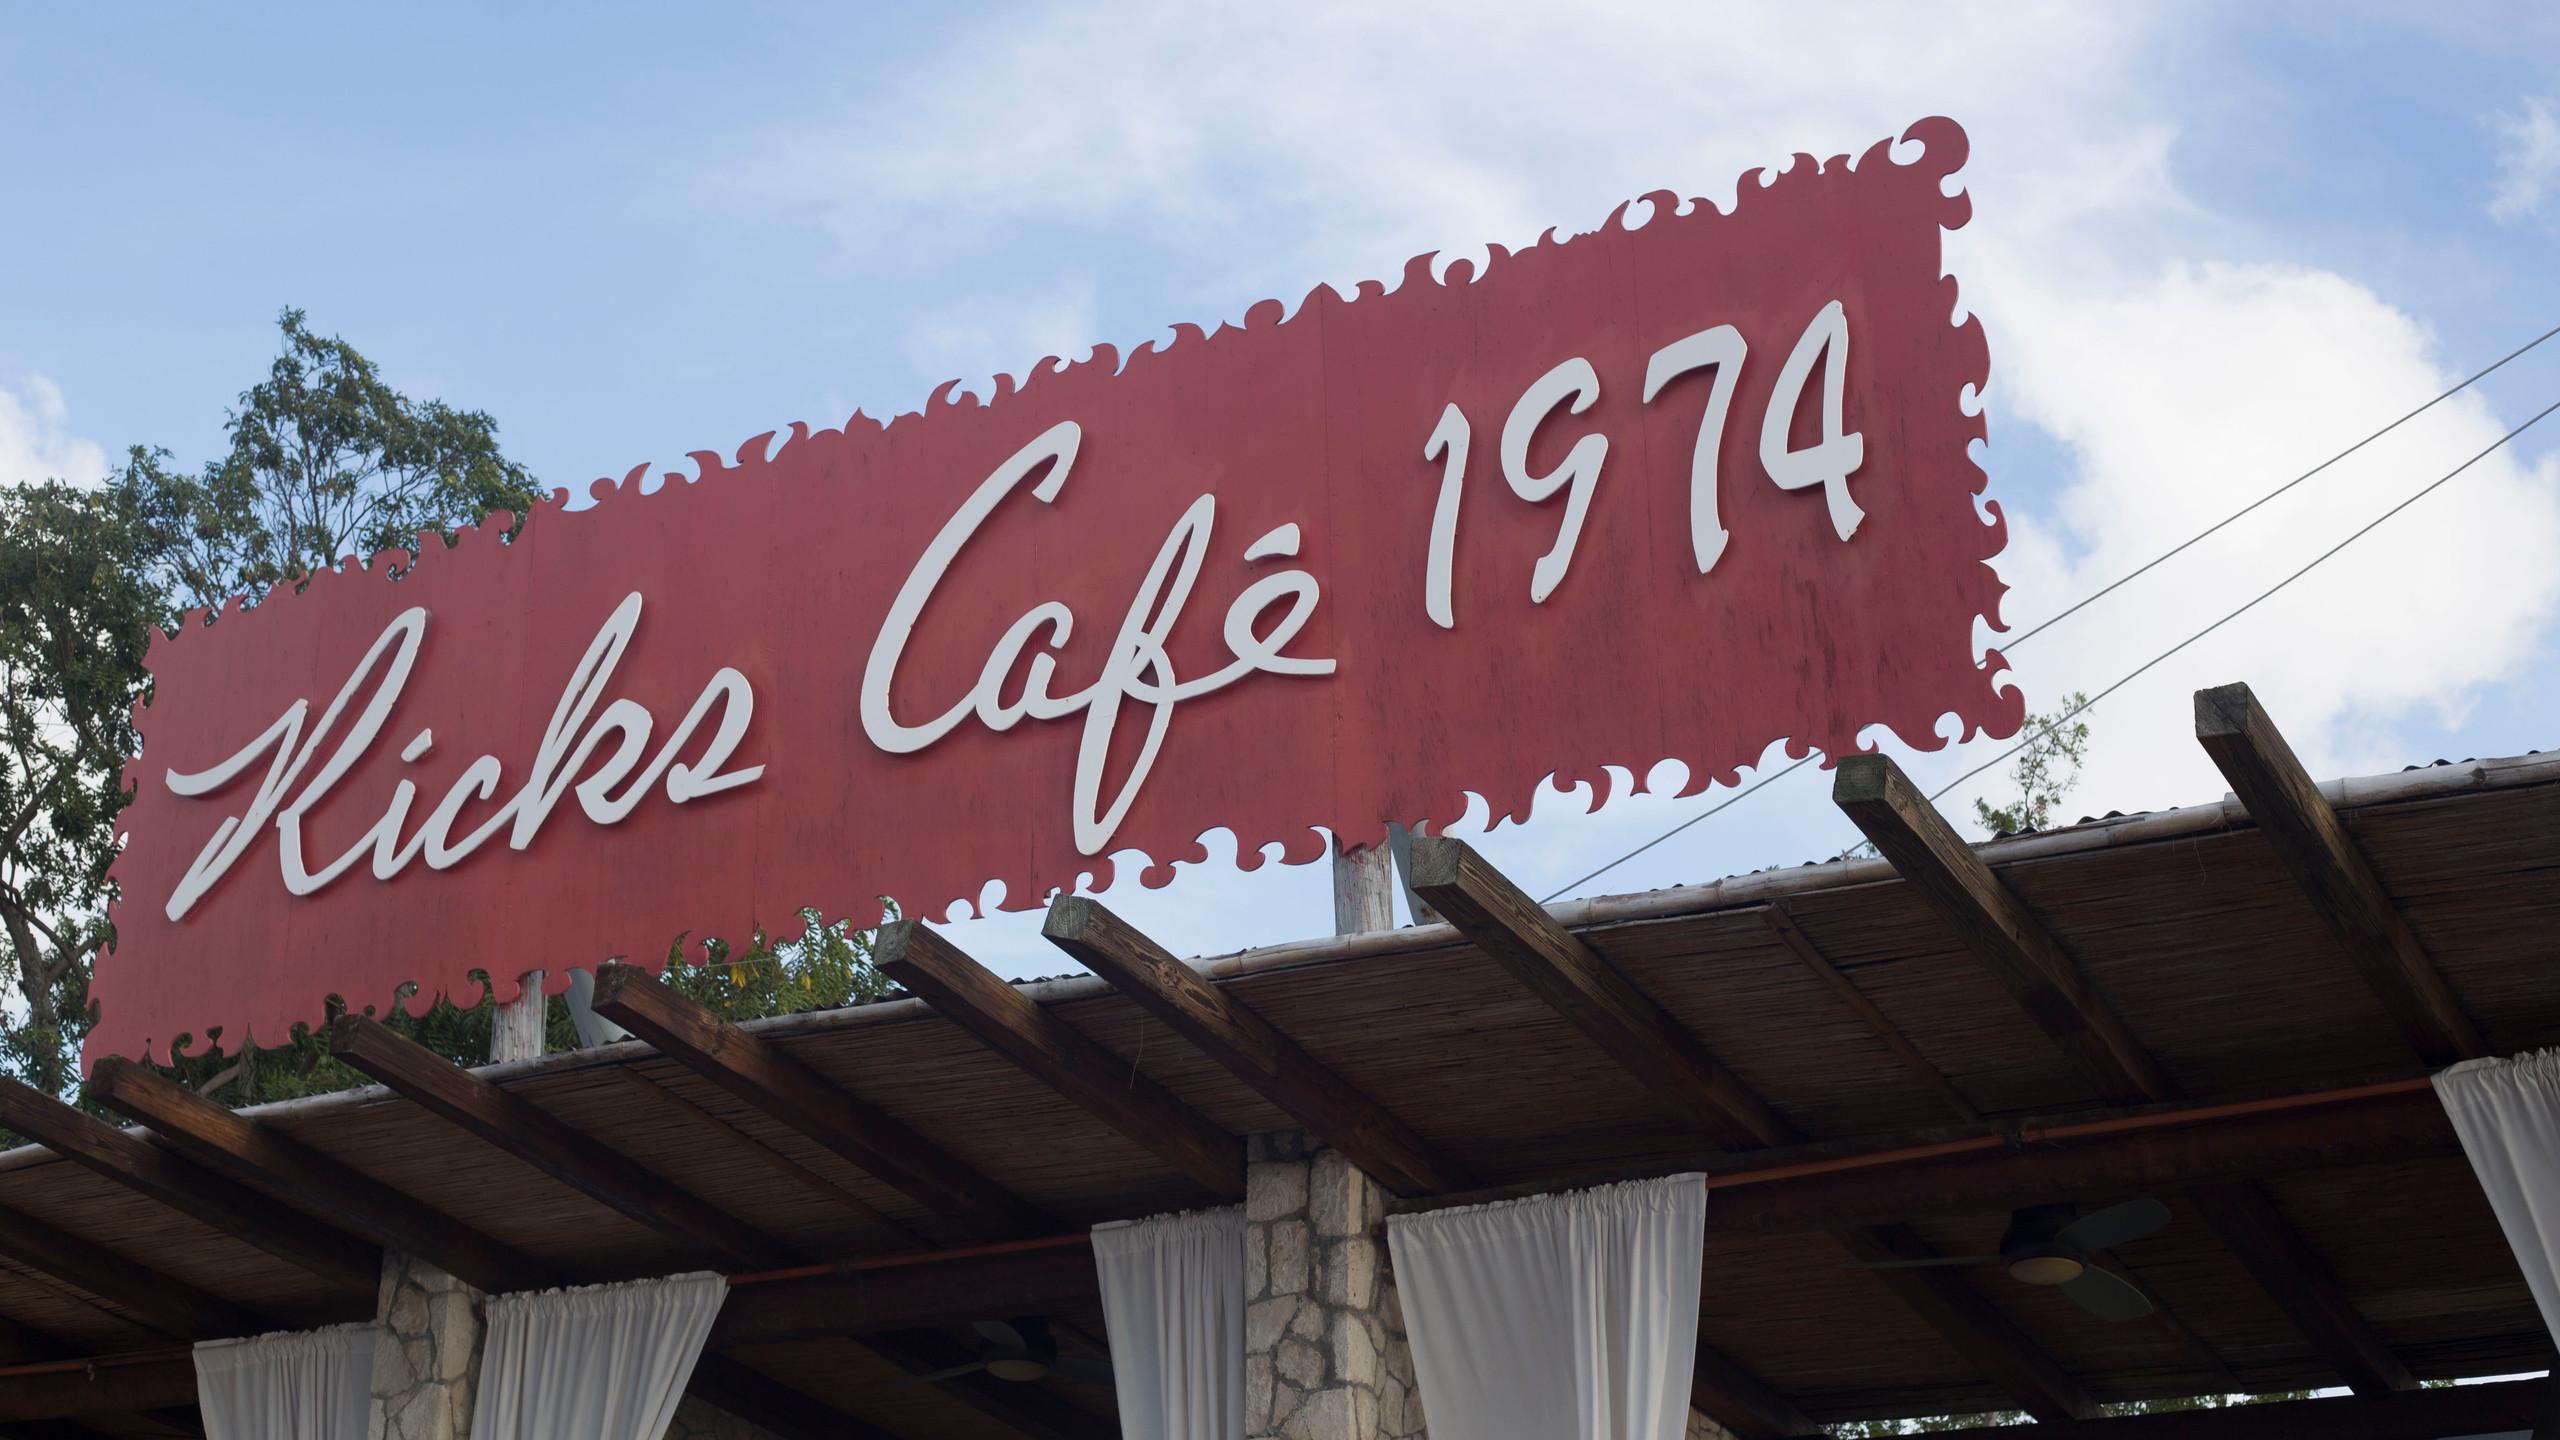 Ricks Cafe sign 2